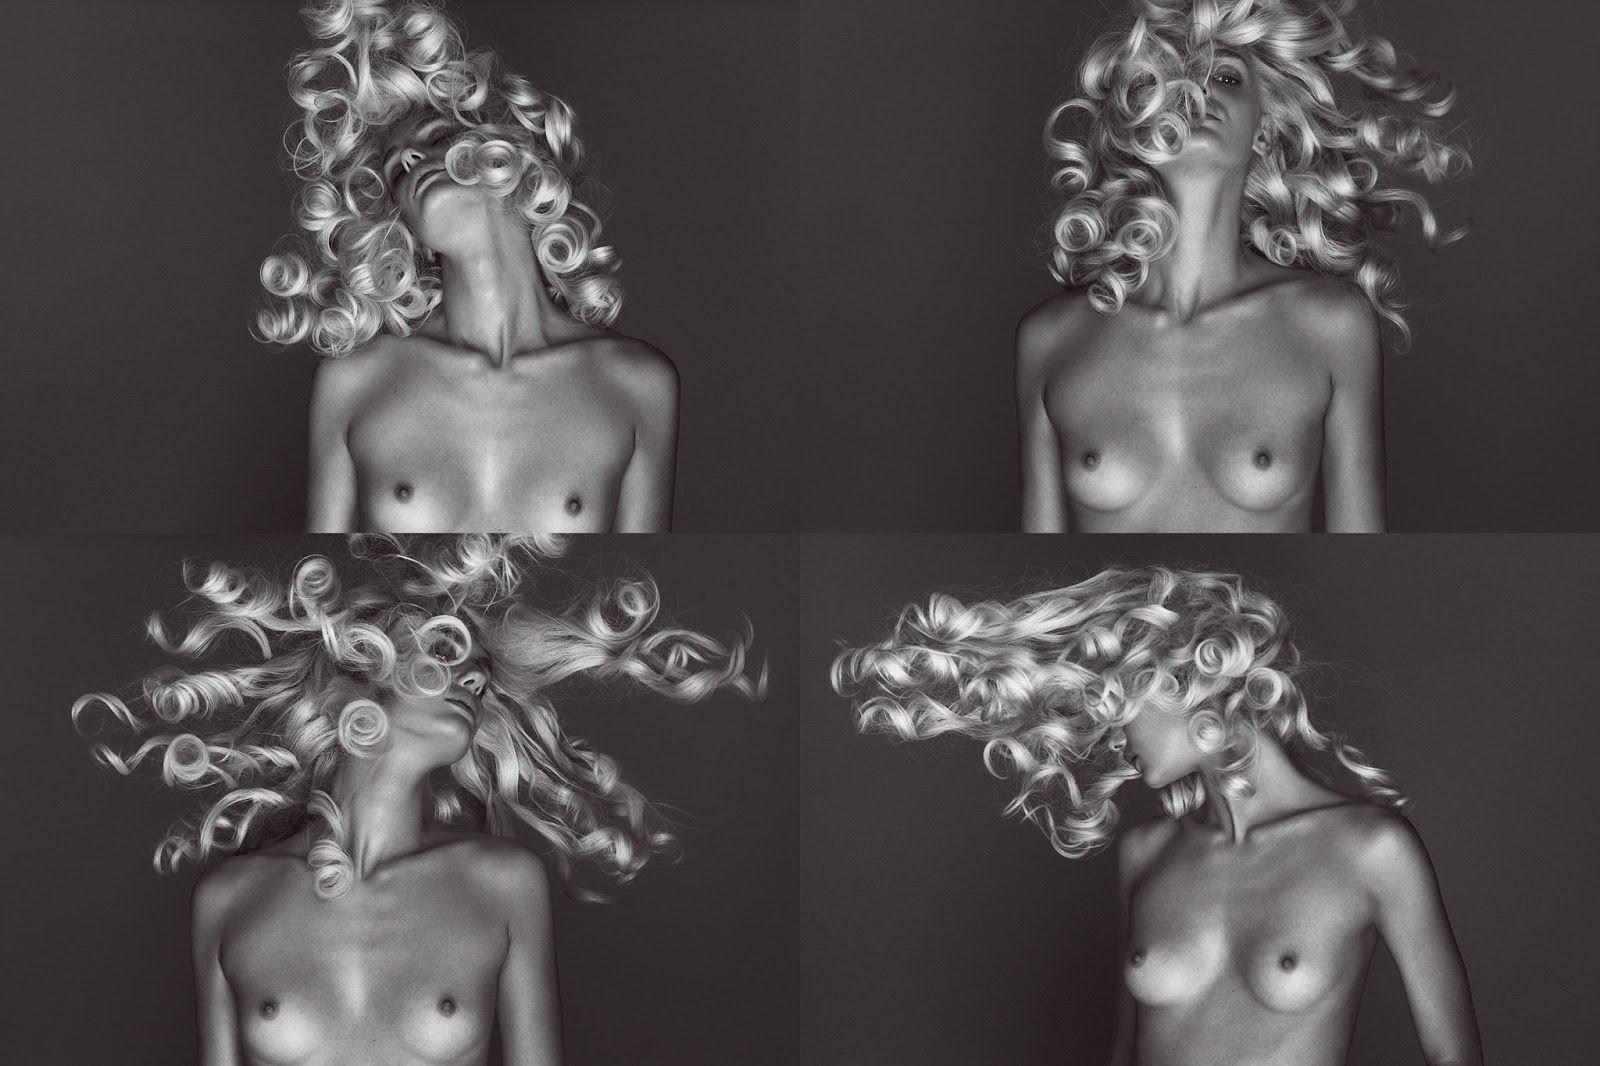 Marta bez naked naked (52 pic)